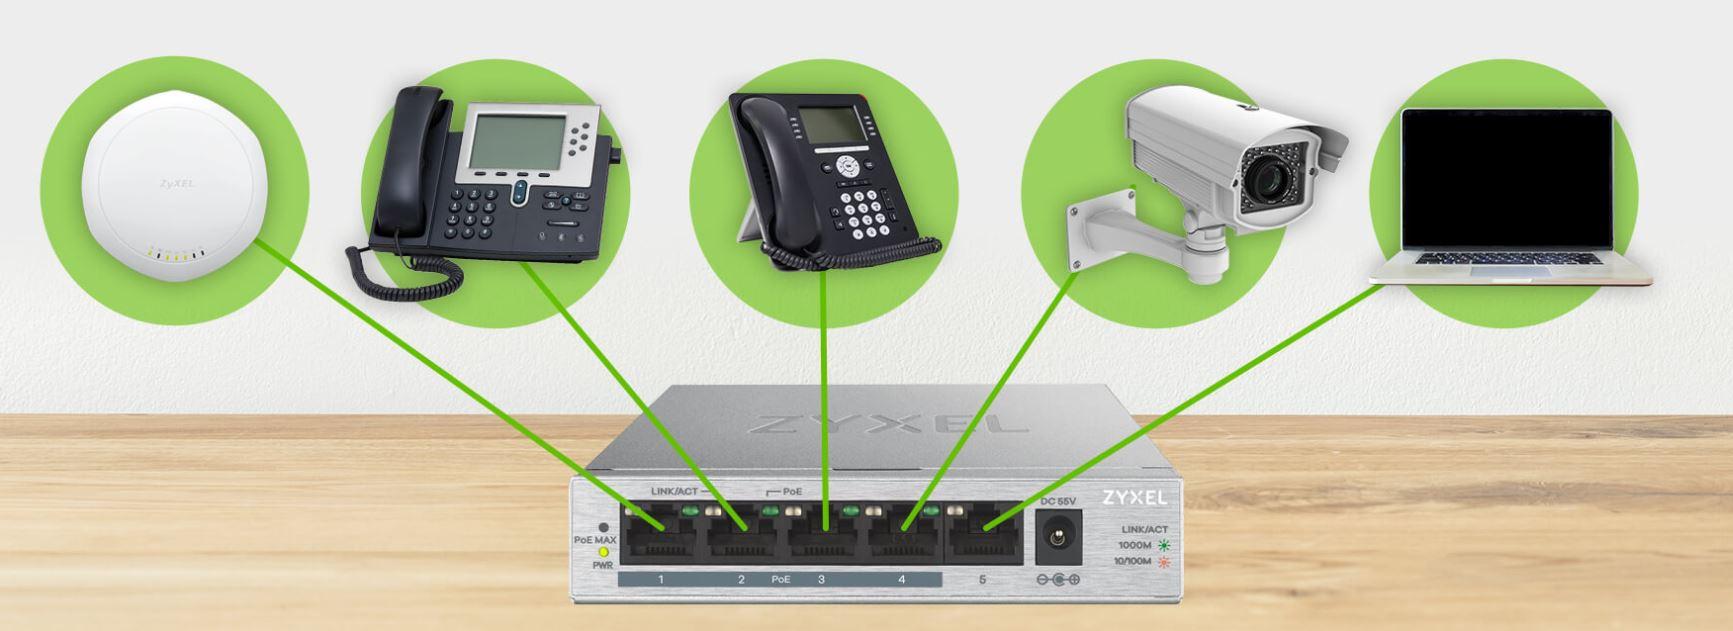 Zyxel GS1005HP 5-Port GbE Unmanaged PoE Switch 02